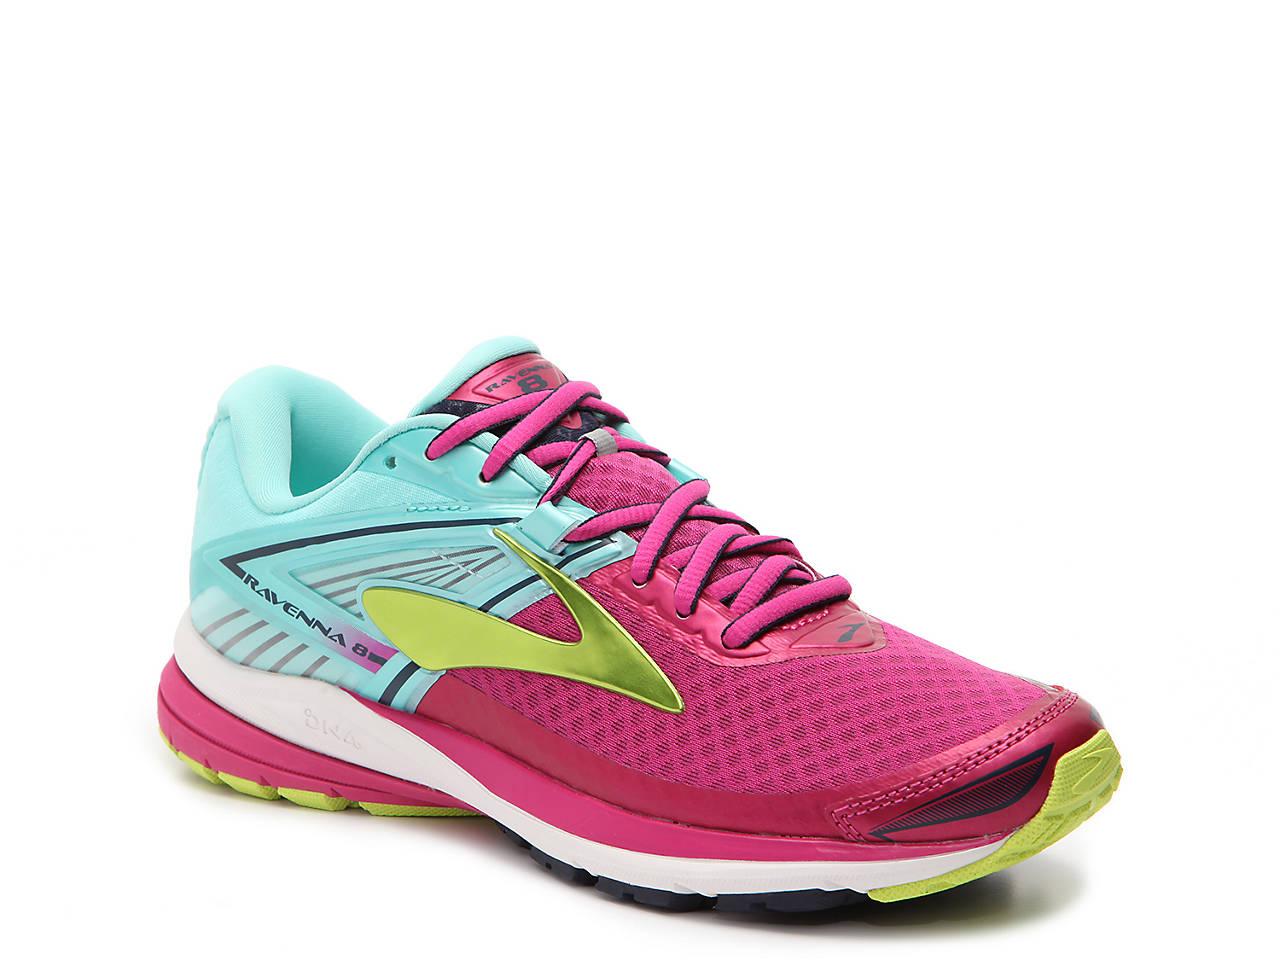 buy online e7ffb 8b948 Ravenna 8 Performance Running Shoe - Women's